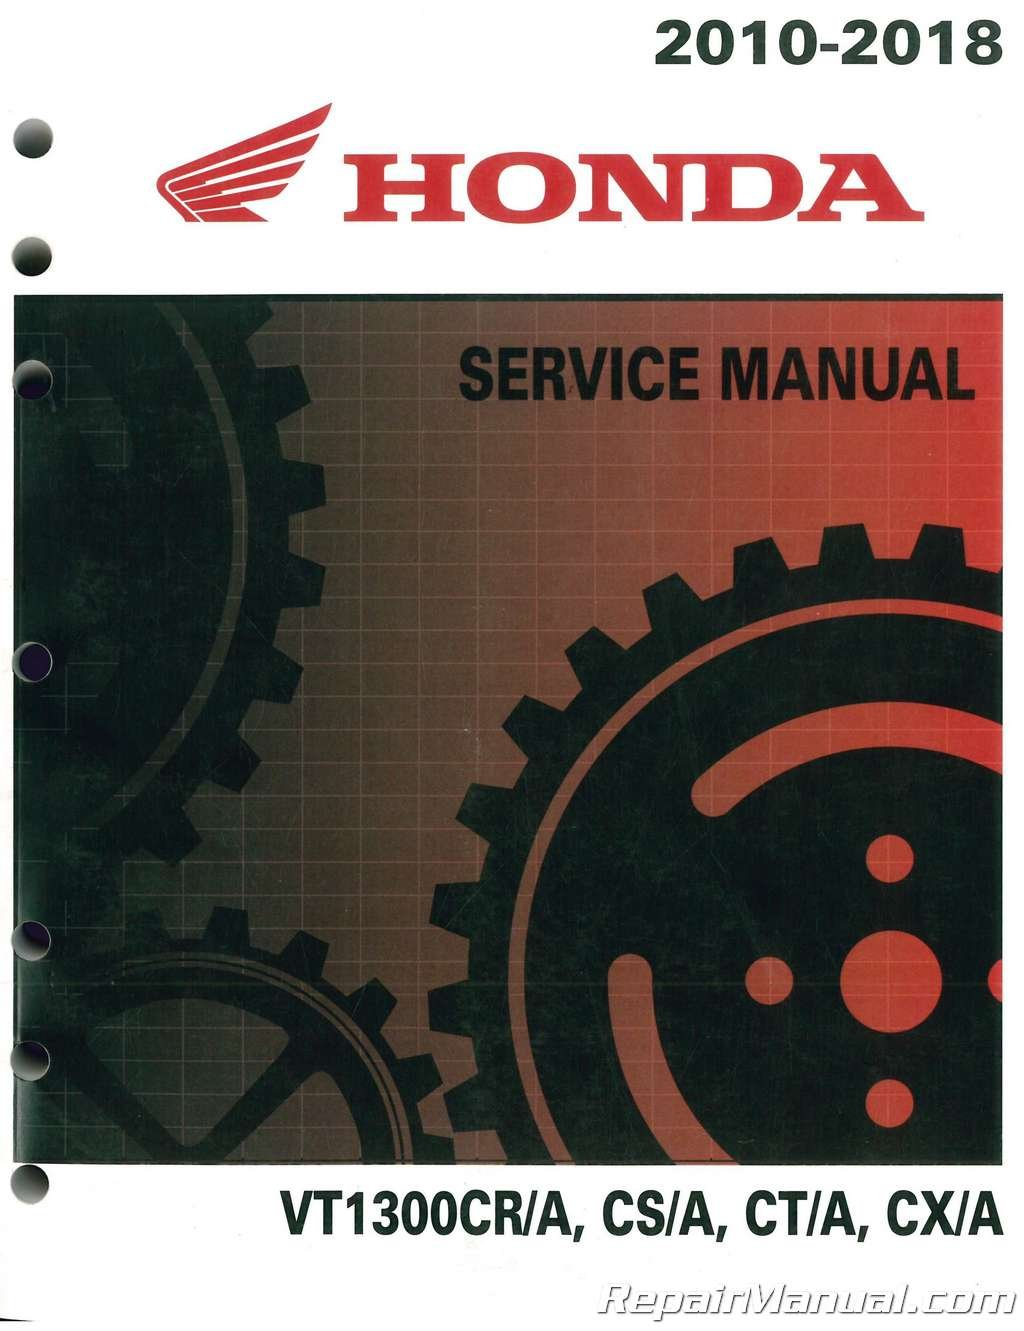 2010 Honda Fury Wiring Diagram Trusted Schematics Nc700x 61mfr11 2018 Vt1300cr Cra Cs Ct Cta Cx Cxa Stateline 2007 Civic